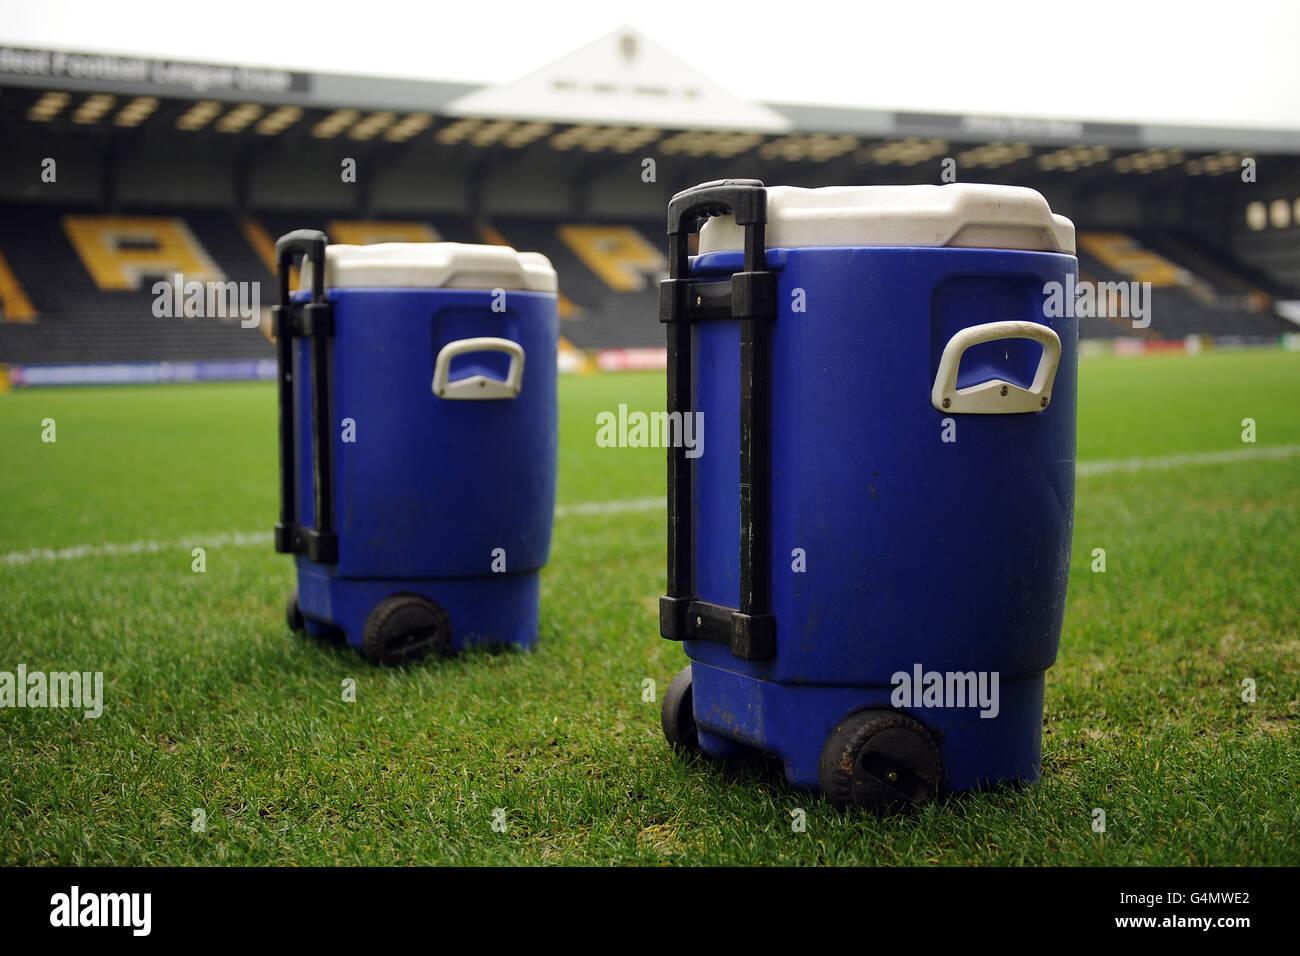 Fútbol - Liga de Fútbol npower uno - Notts County v Wycombe Wanderers - Meadow Lane Foto de stock